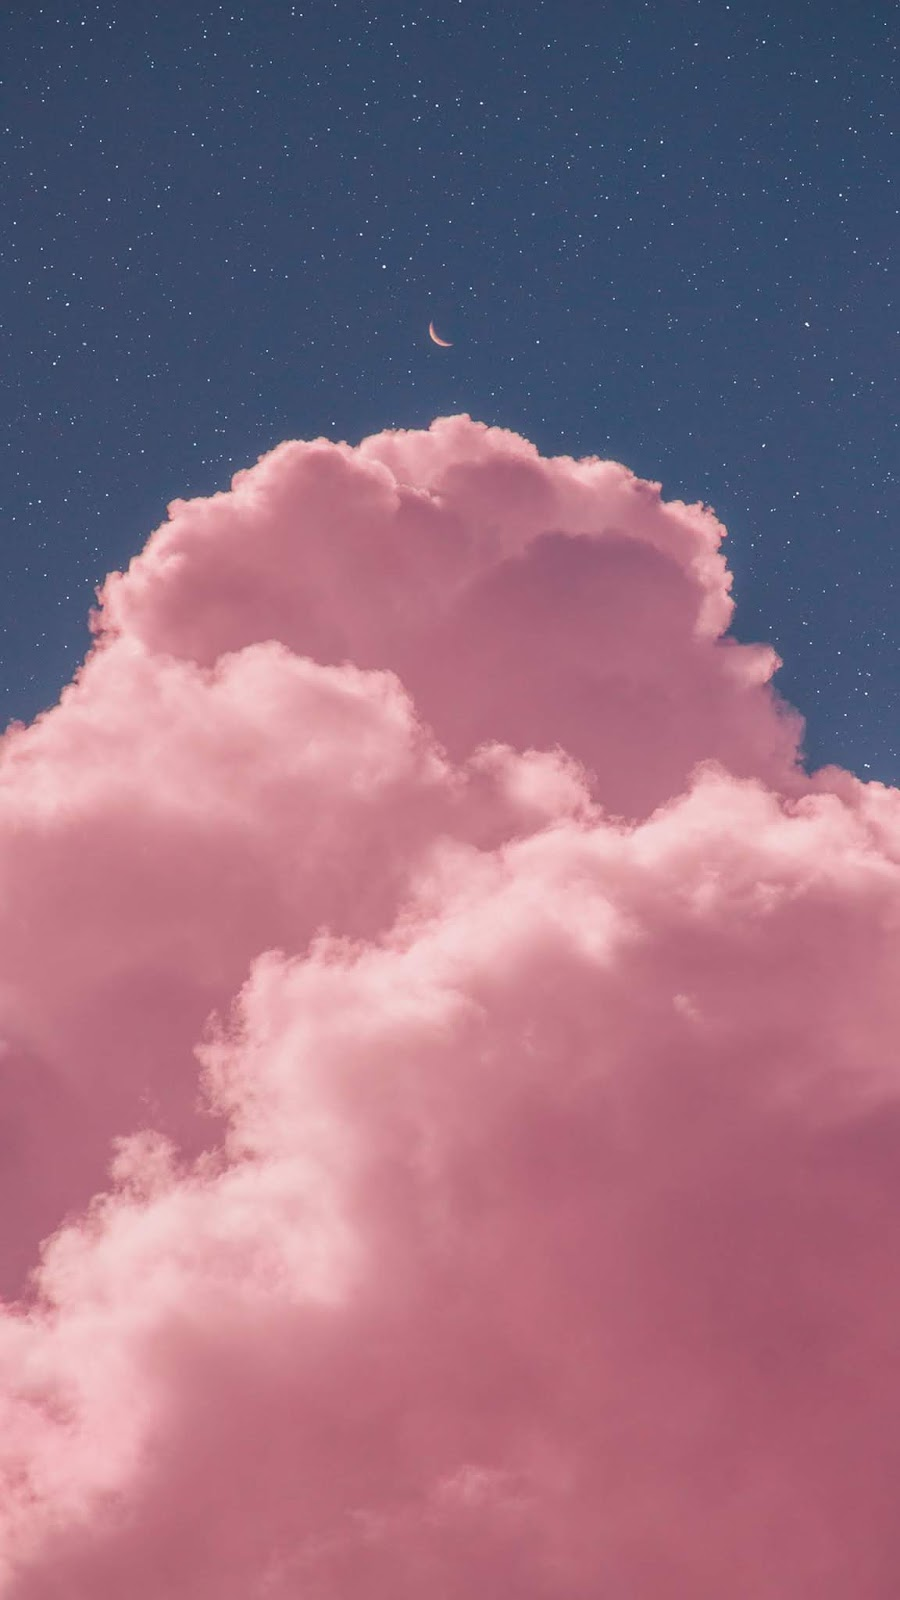 Trời mây hồng